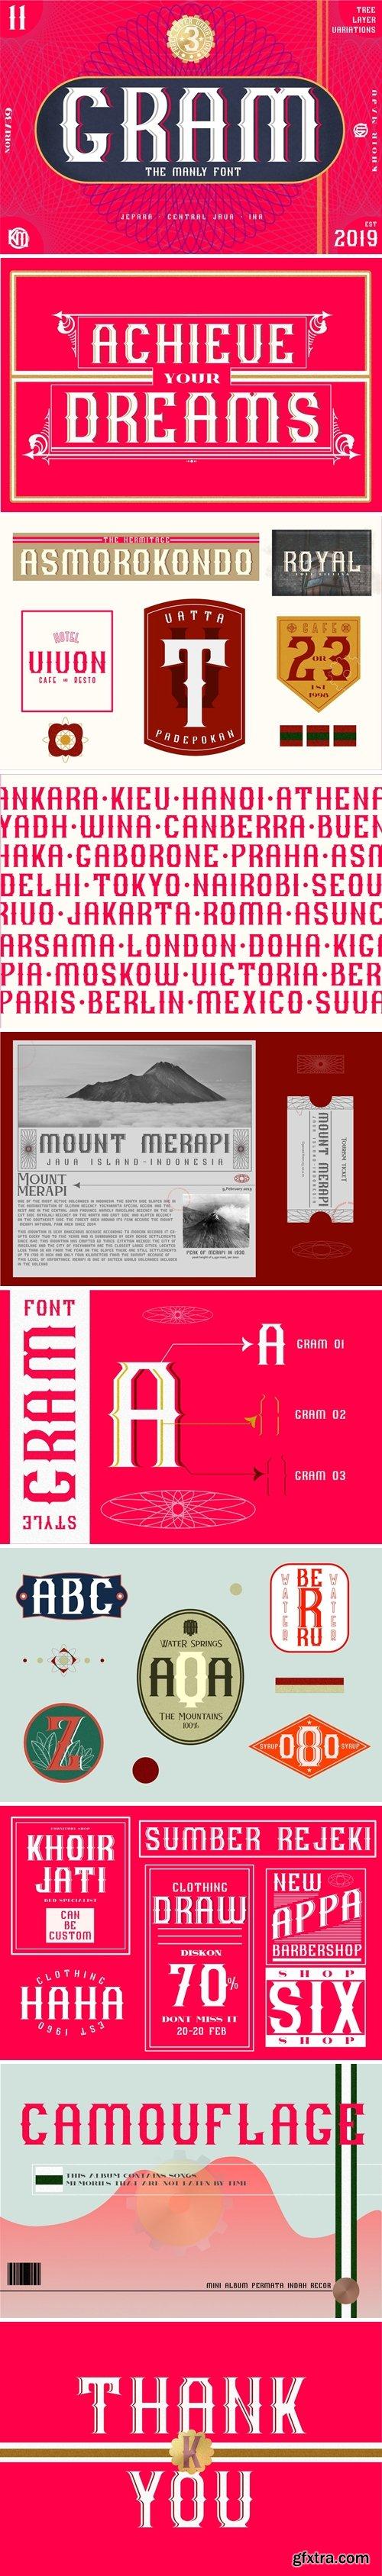 CM - GRAM - New Font Display 3527448